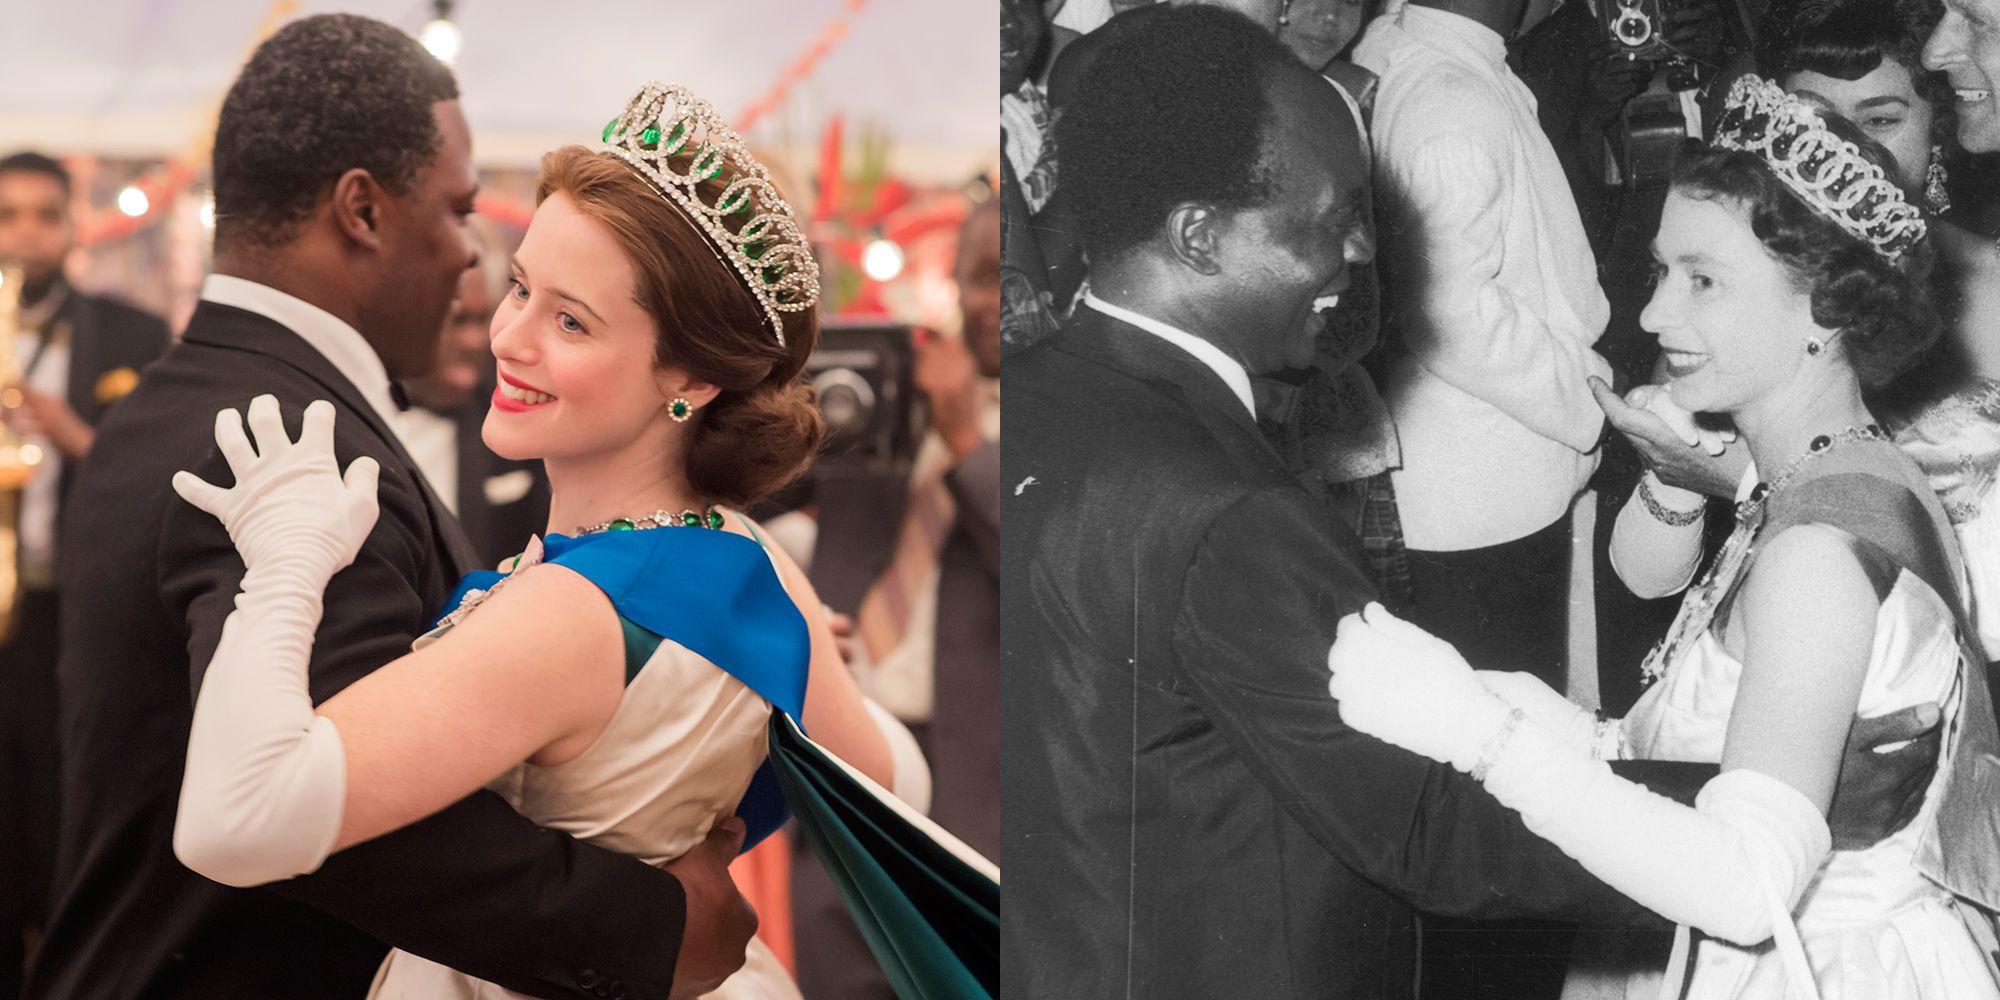 Queen Elizabeth II (seasons one and two)